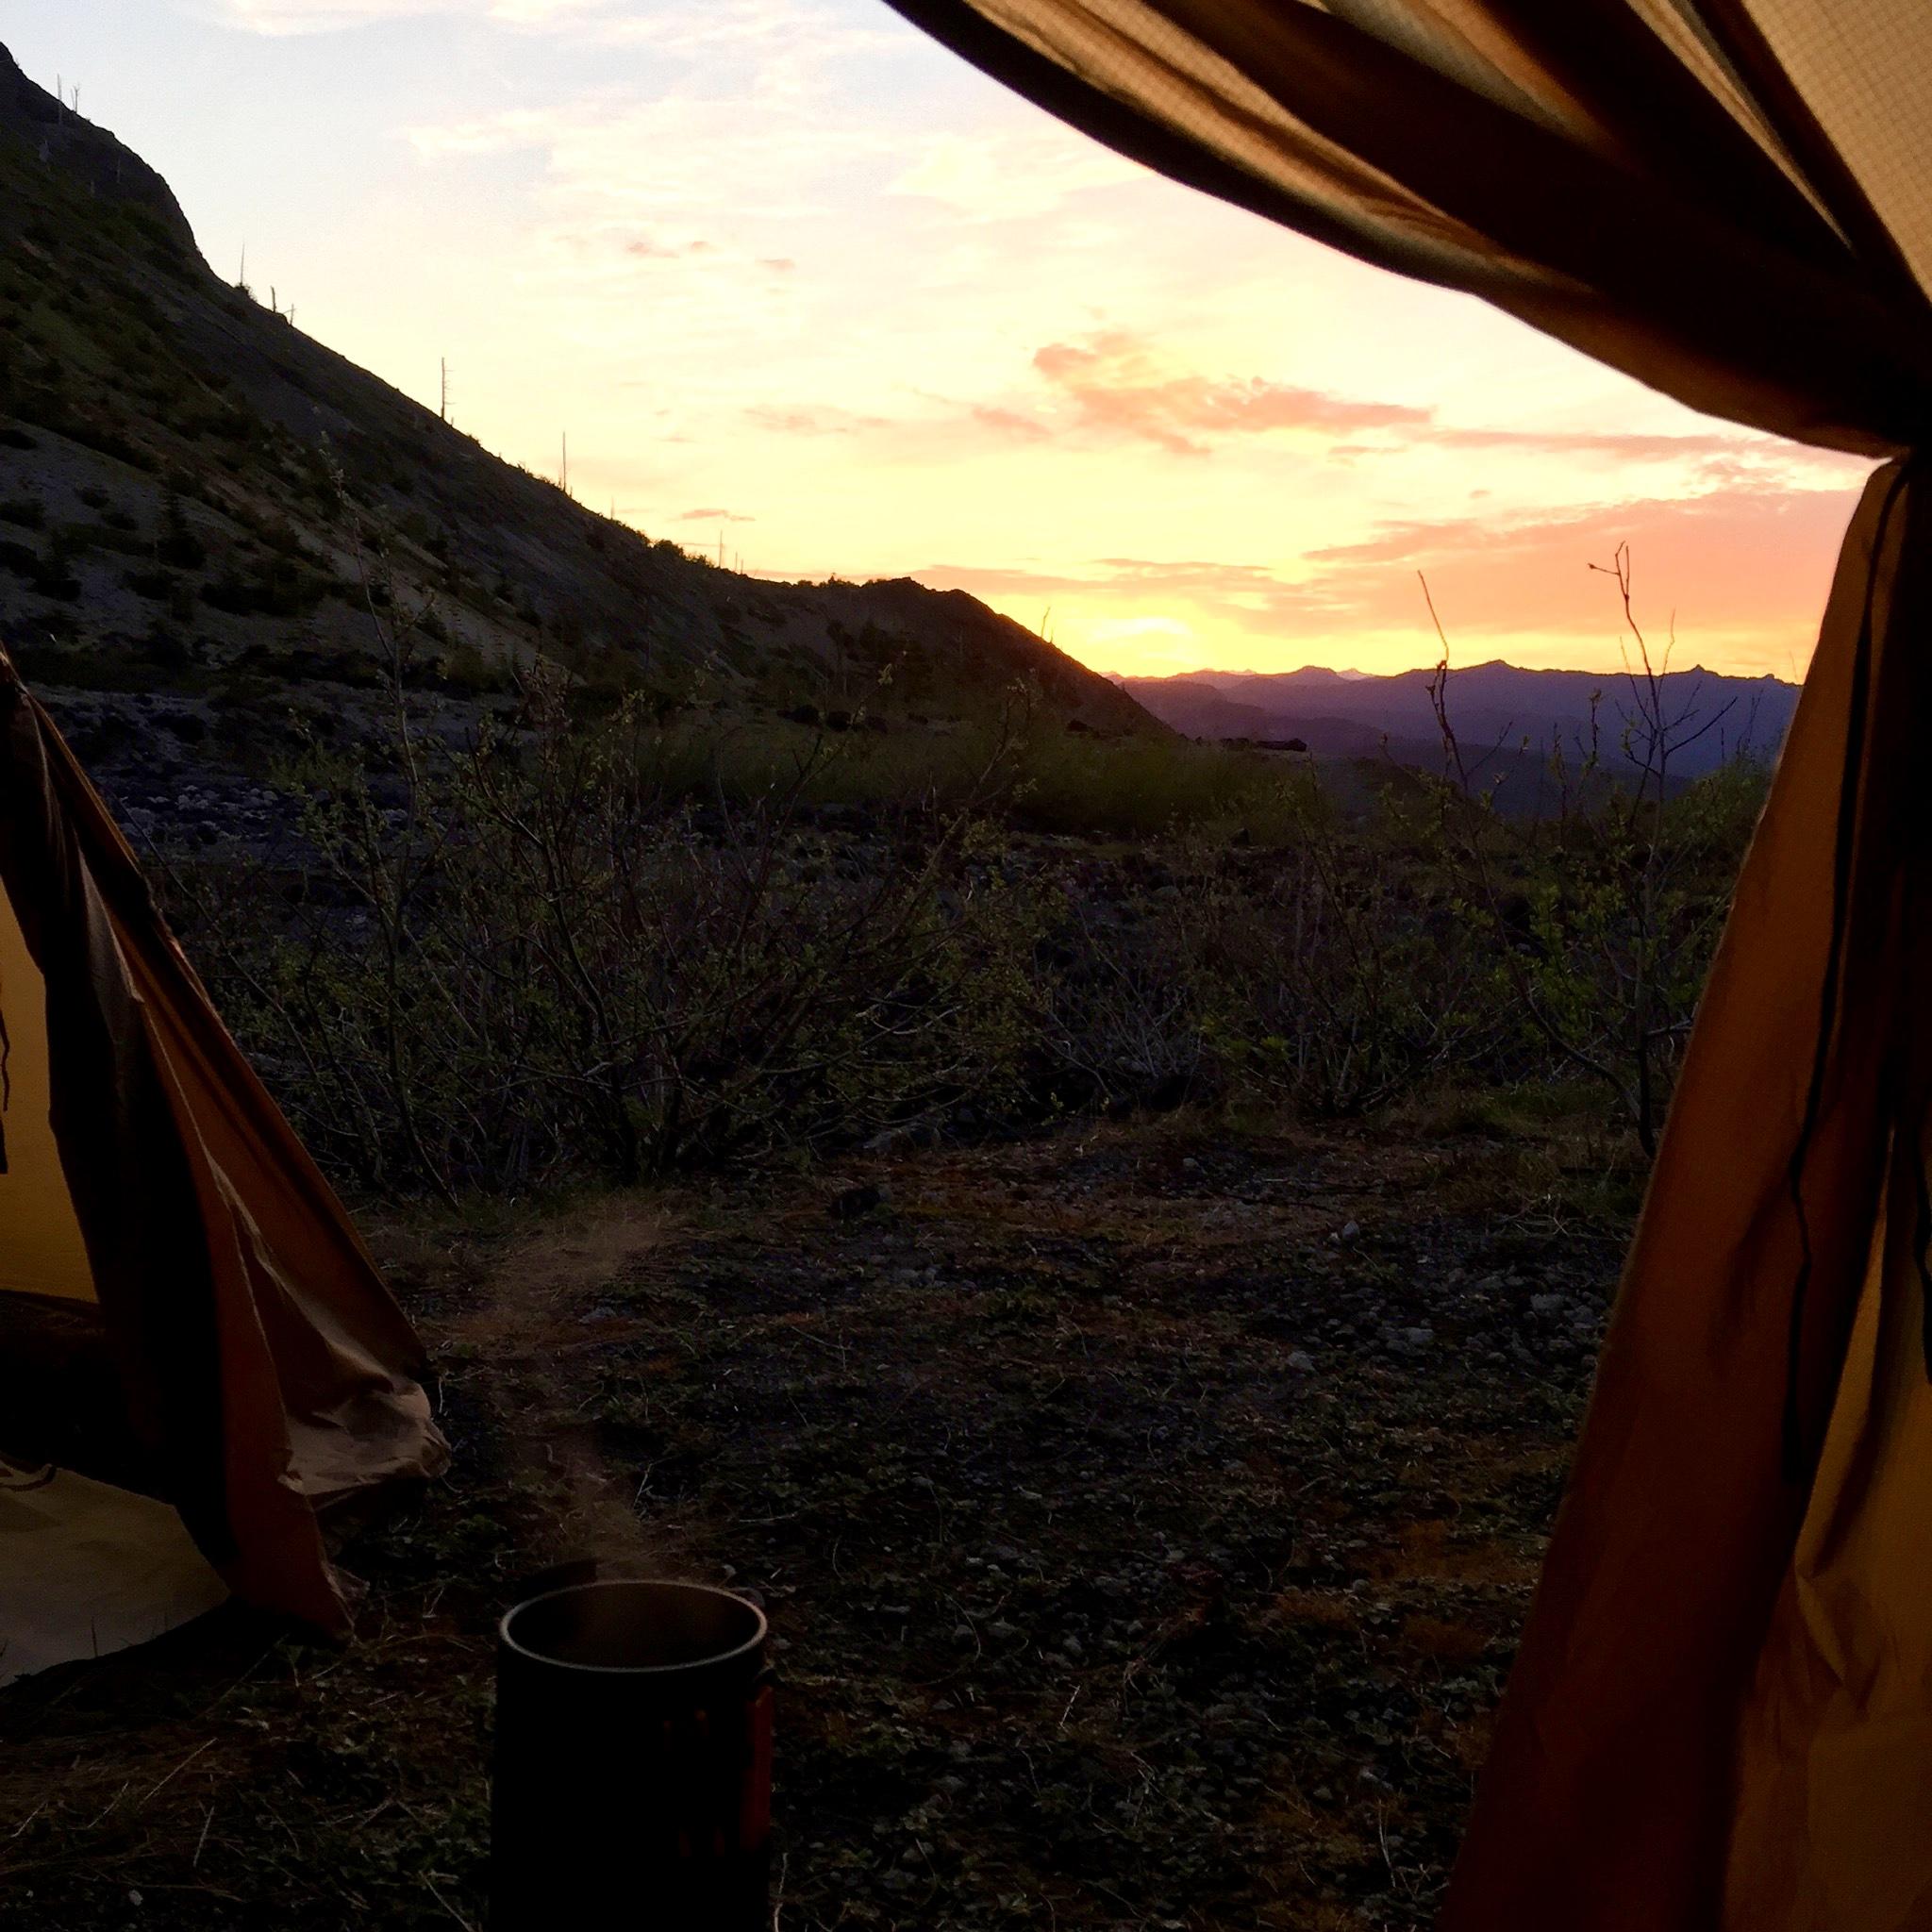 Day 3 sunrise. Photo by Chris Murray.